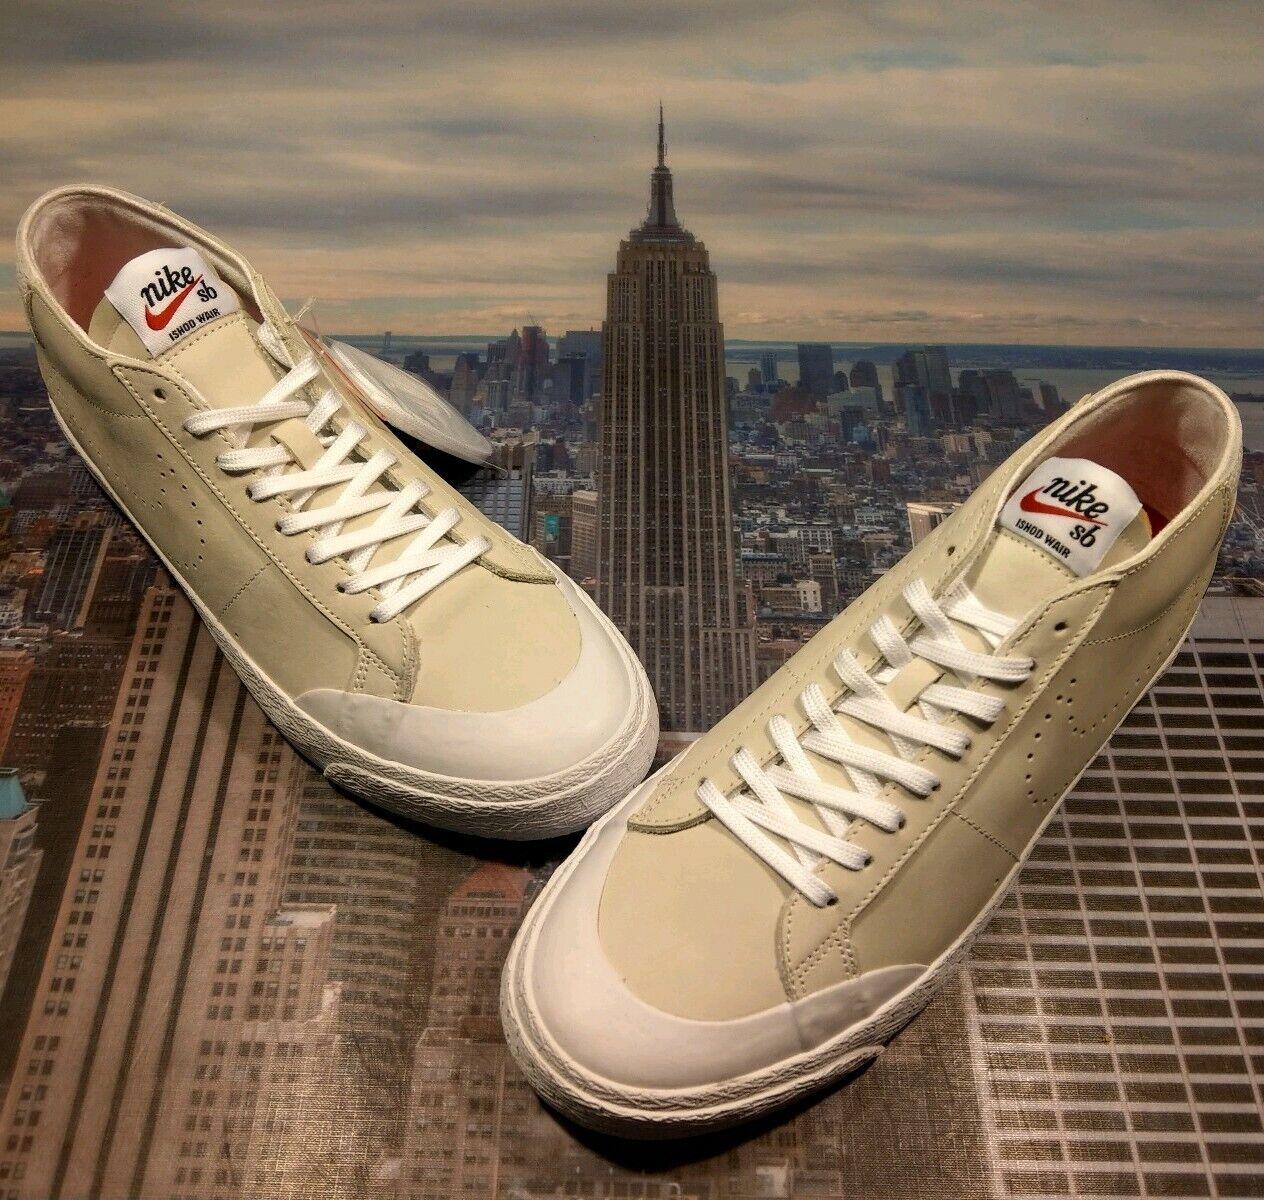 Nike SB Zoom Blazer Chukka XT QS Ishod Wair Sail Mens Size 11 AR5410 161 New